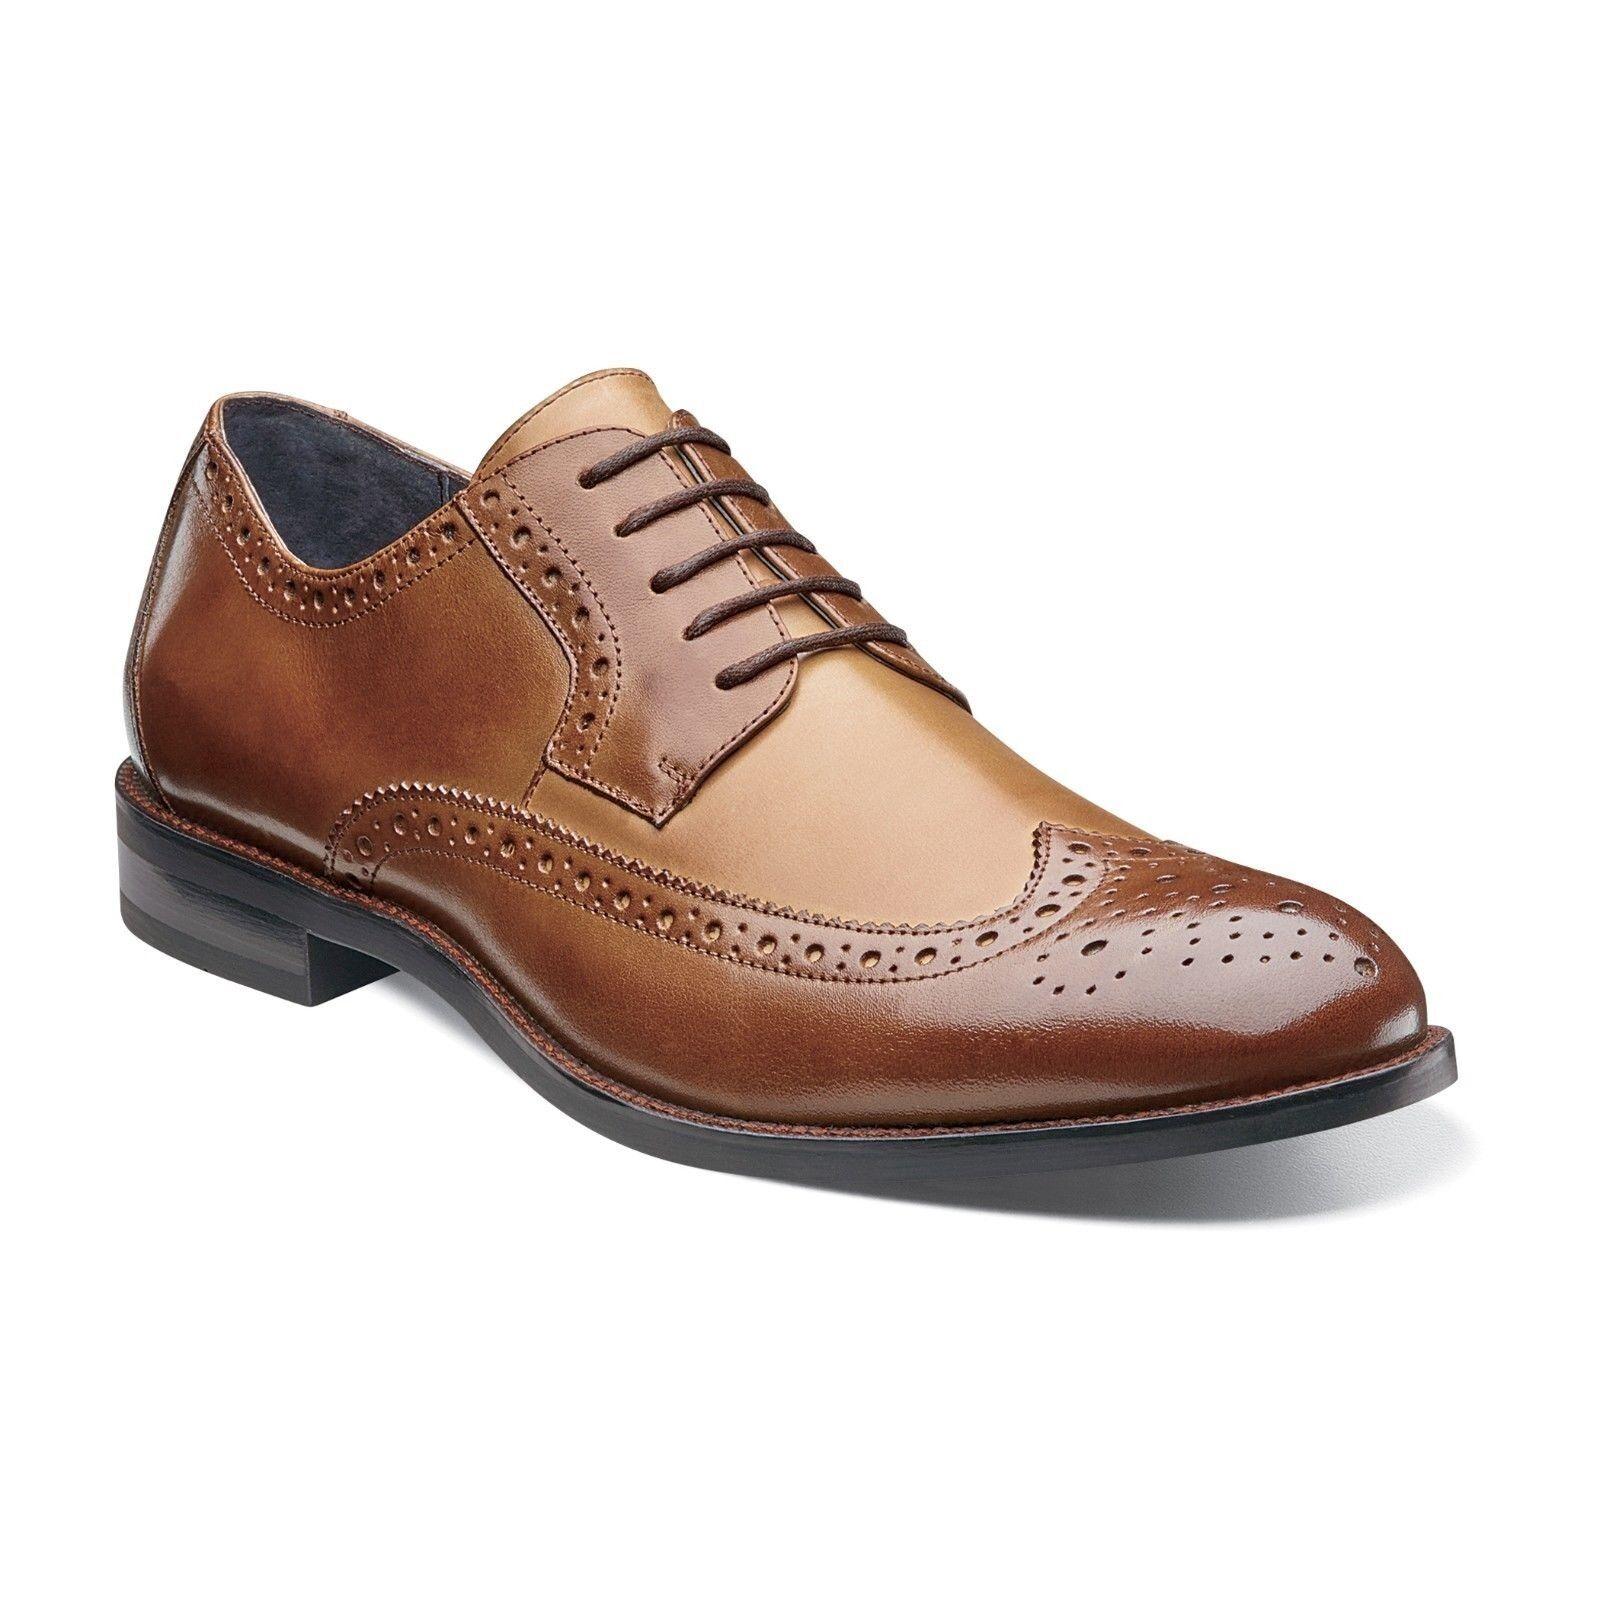 Stacy Adams Uomo Brown & Cognac Garrison Pelle Wing Tip Lace Up Dress Shoe